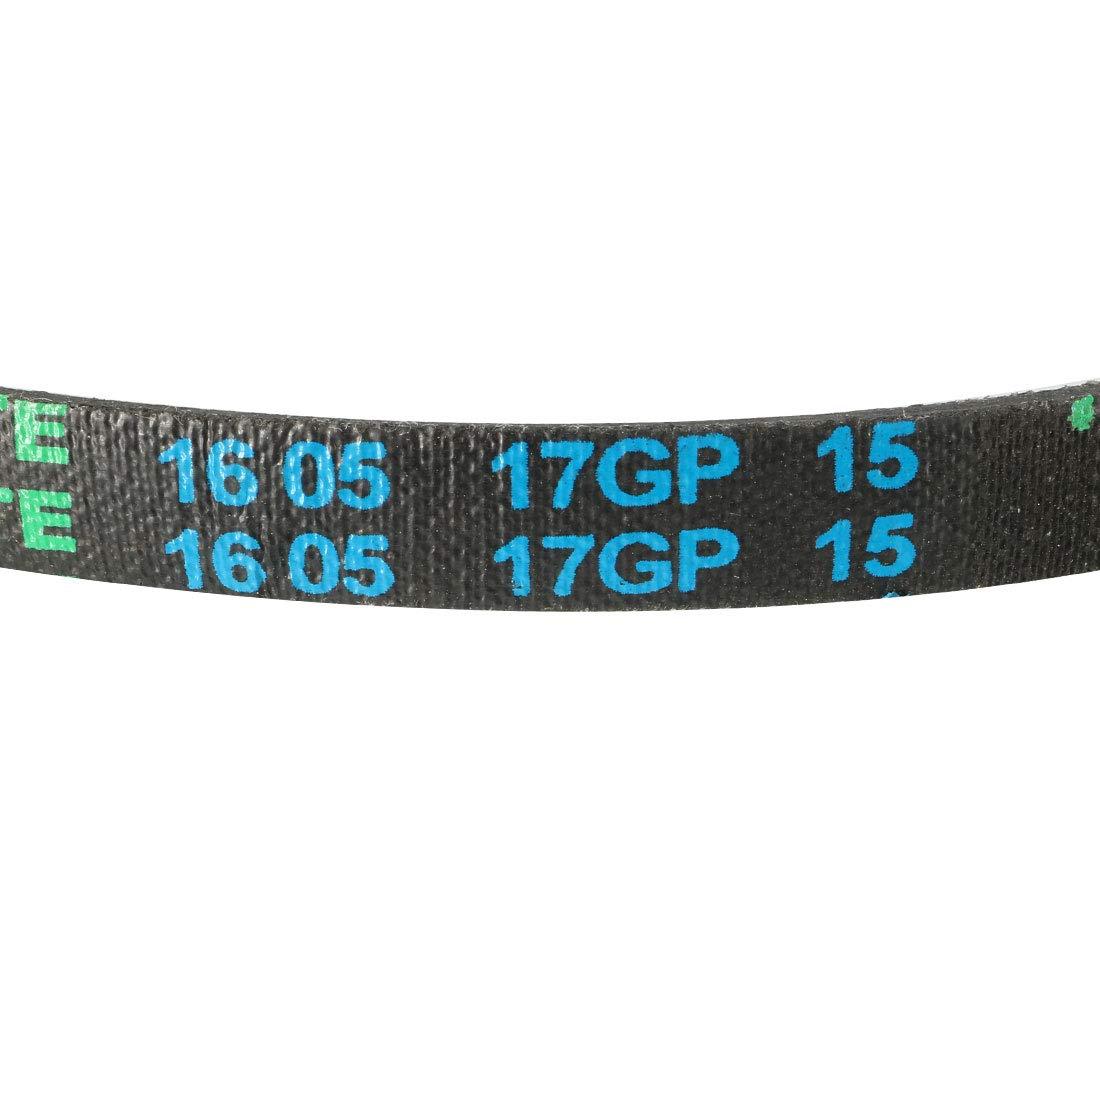 sourcing map M-21 V Belt Machine Transmission Rubber,Black Replacement Drive Belt